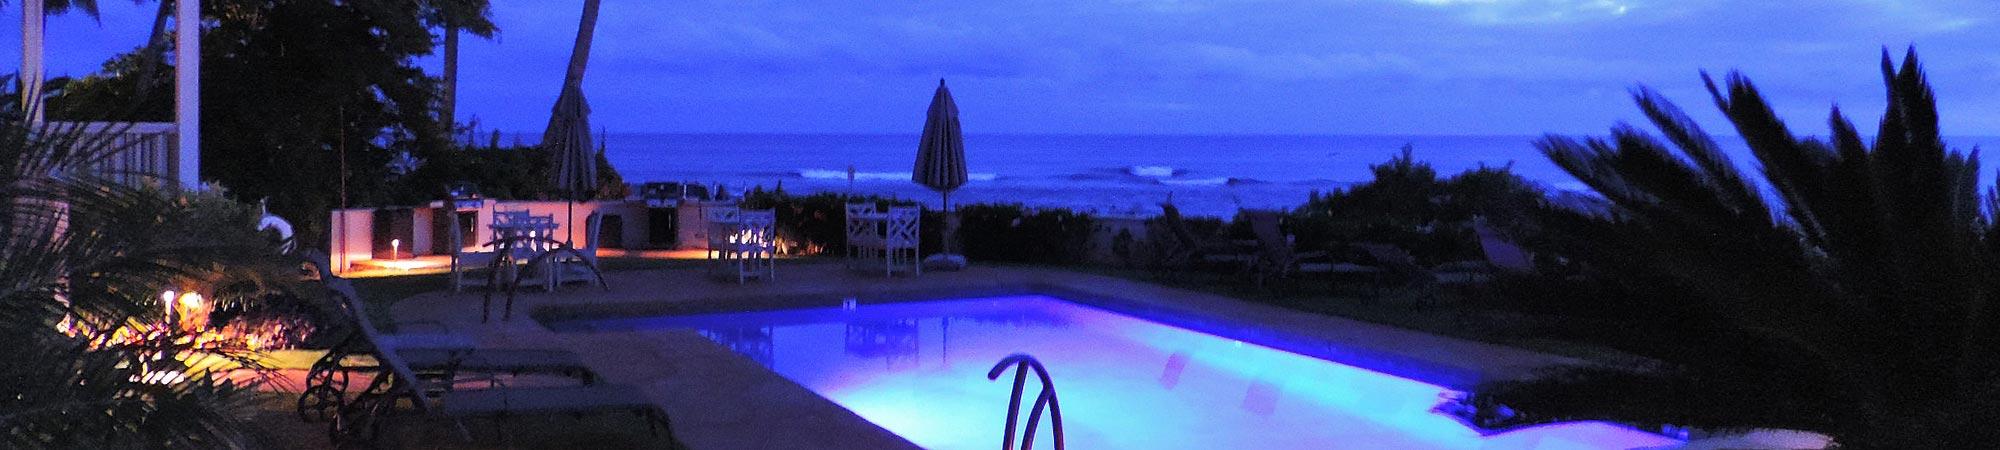 alihi lani pool ocean view twilight